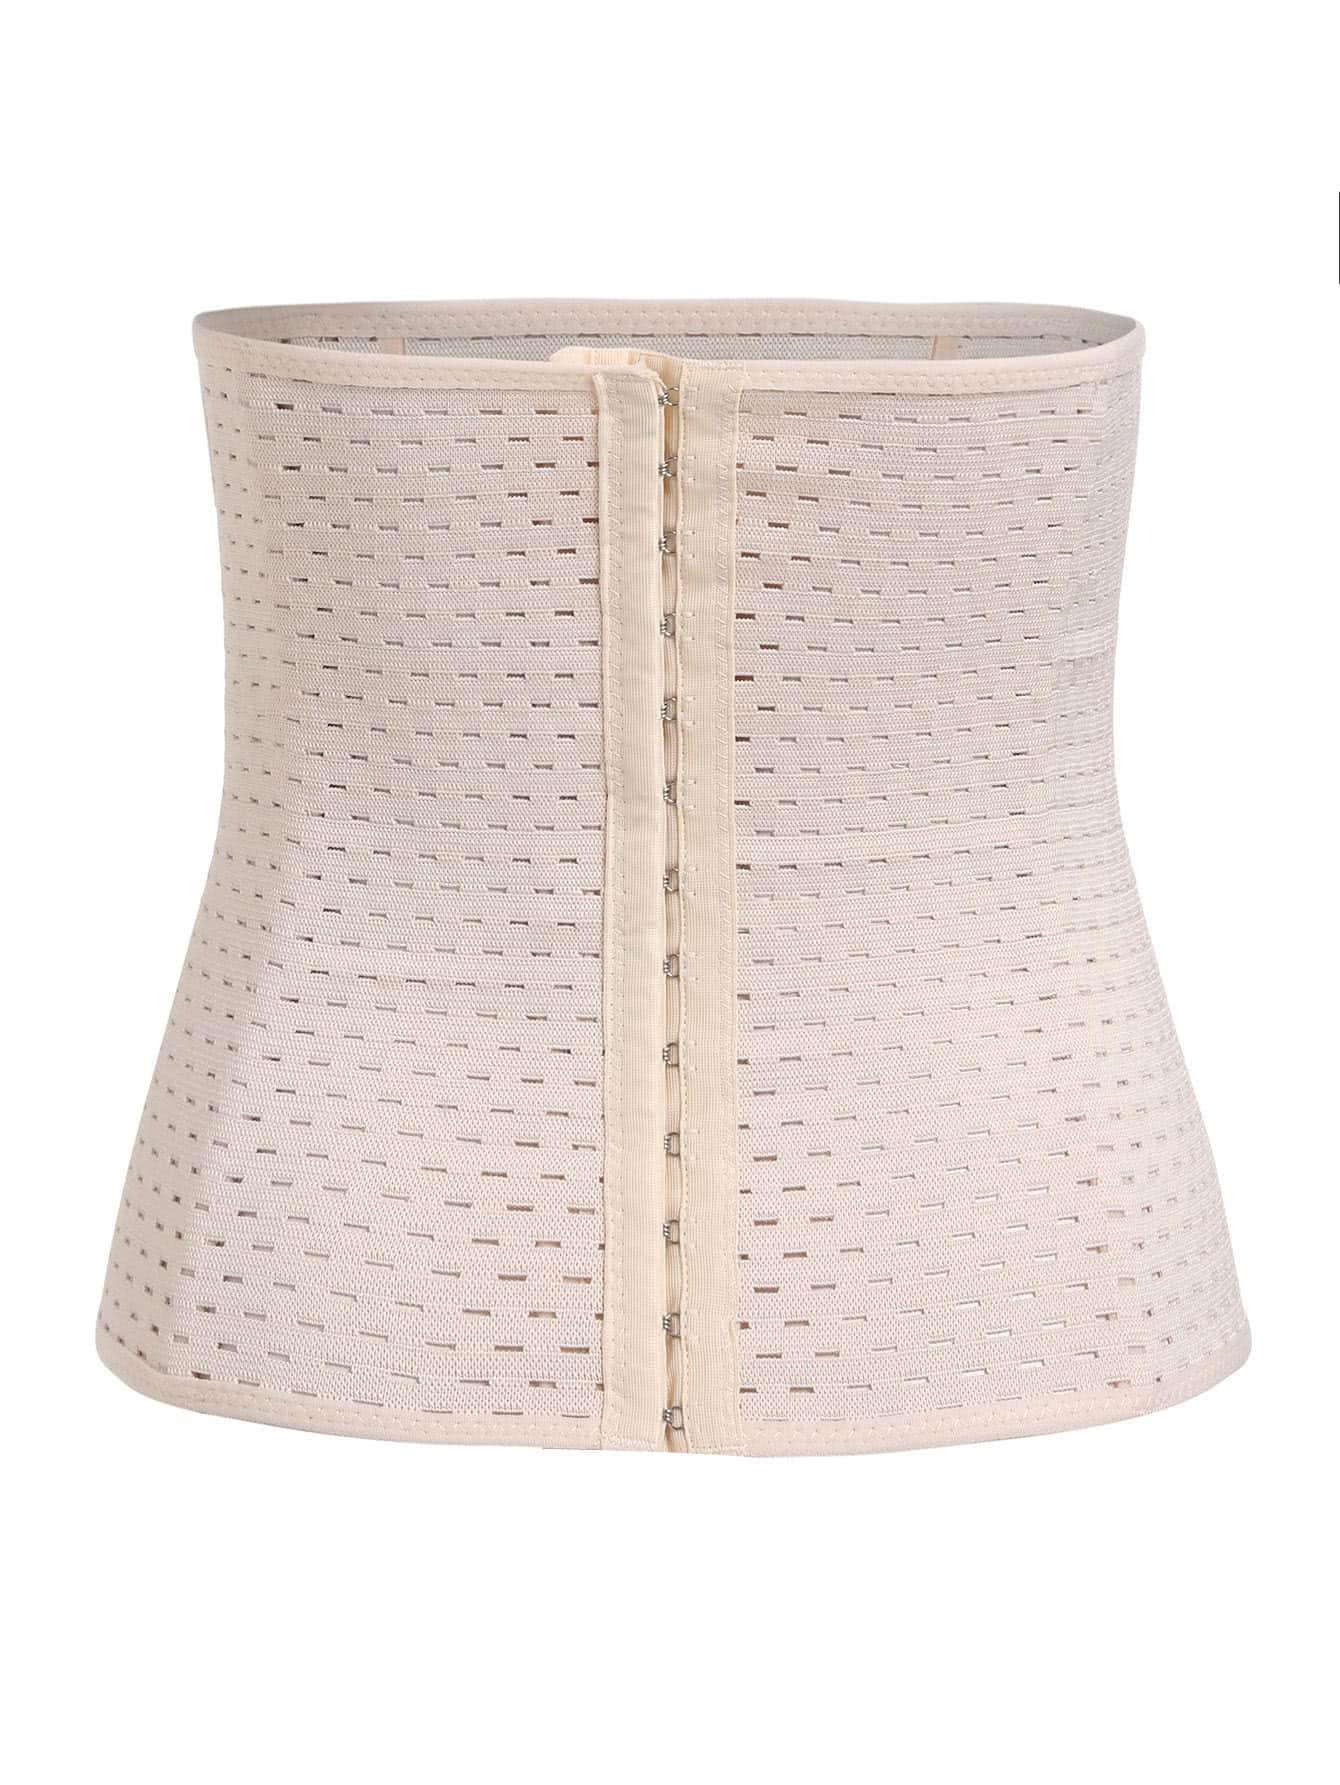 Hook Closure Stretch Corset corset170907301